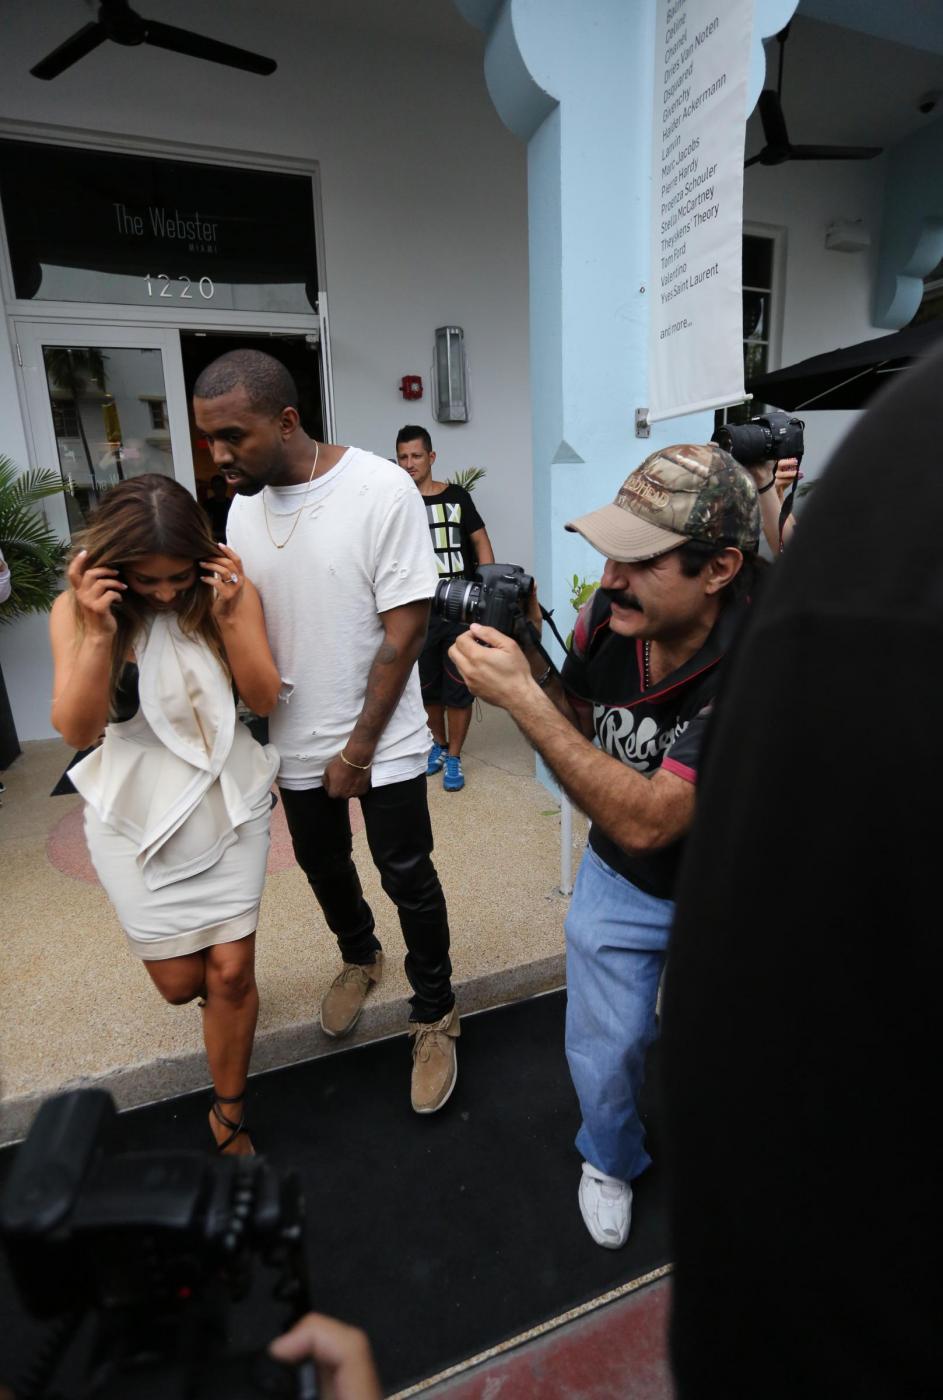 Kim Kardashian e Kanye West, shopping a Miami il giorno del black friday01